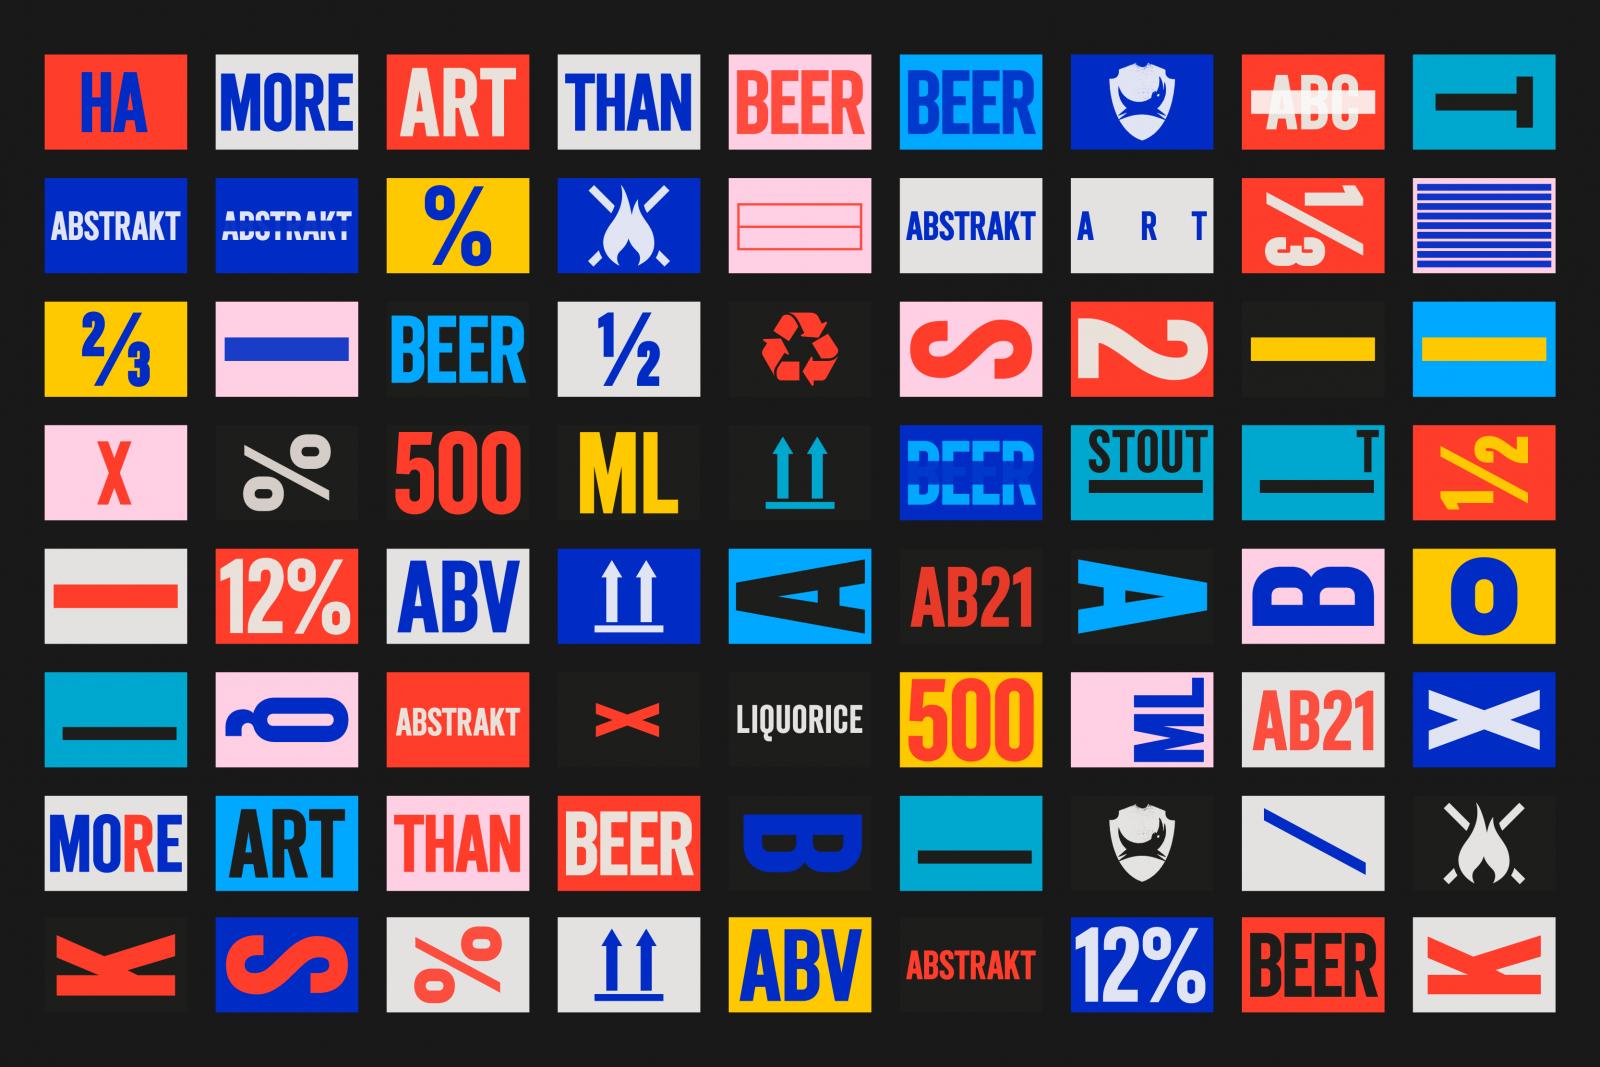 Abstrakt Icons